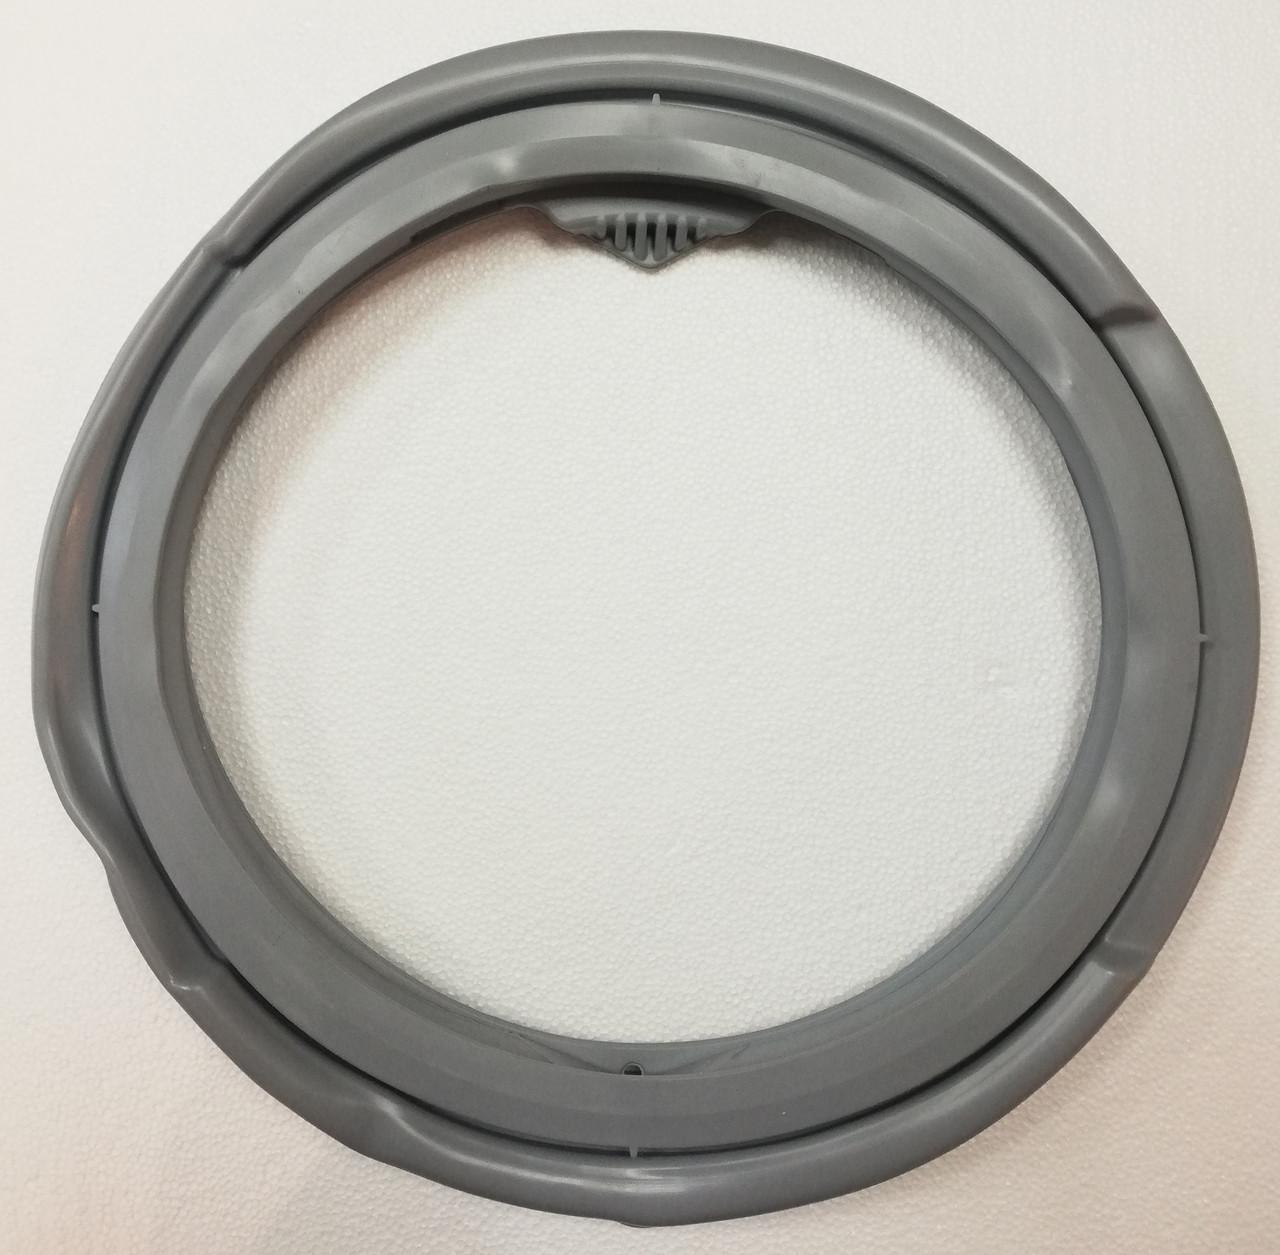 Резина (манжет) люка для пральних машин Electrolux Zanussi 4055113528, 481246689019